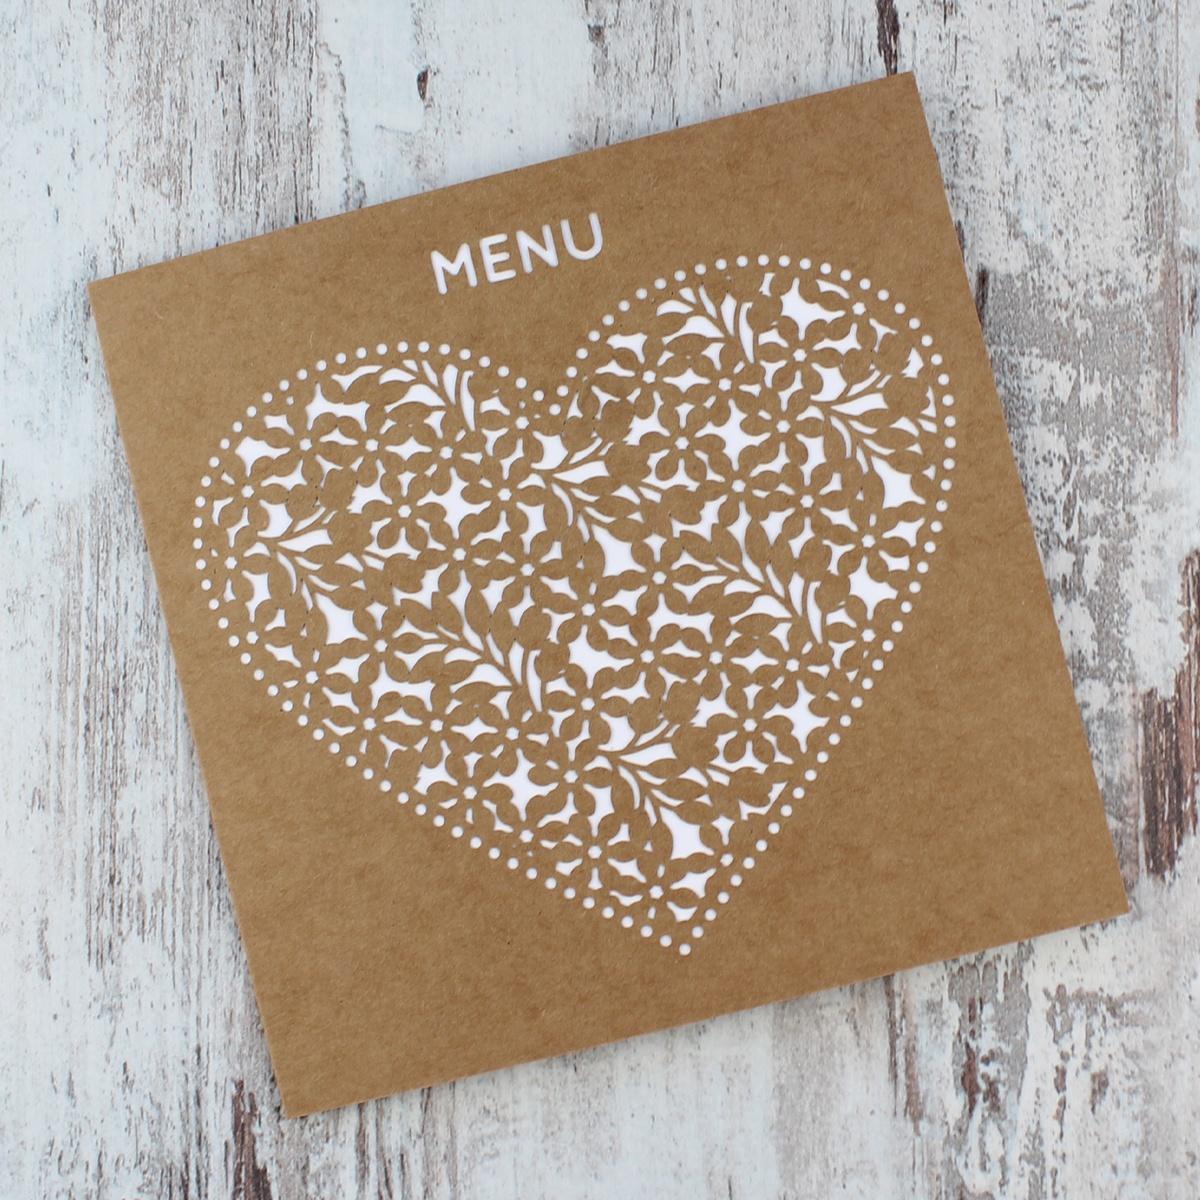 Rustykalne menu weselne, wycinane laserowo